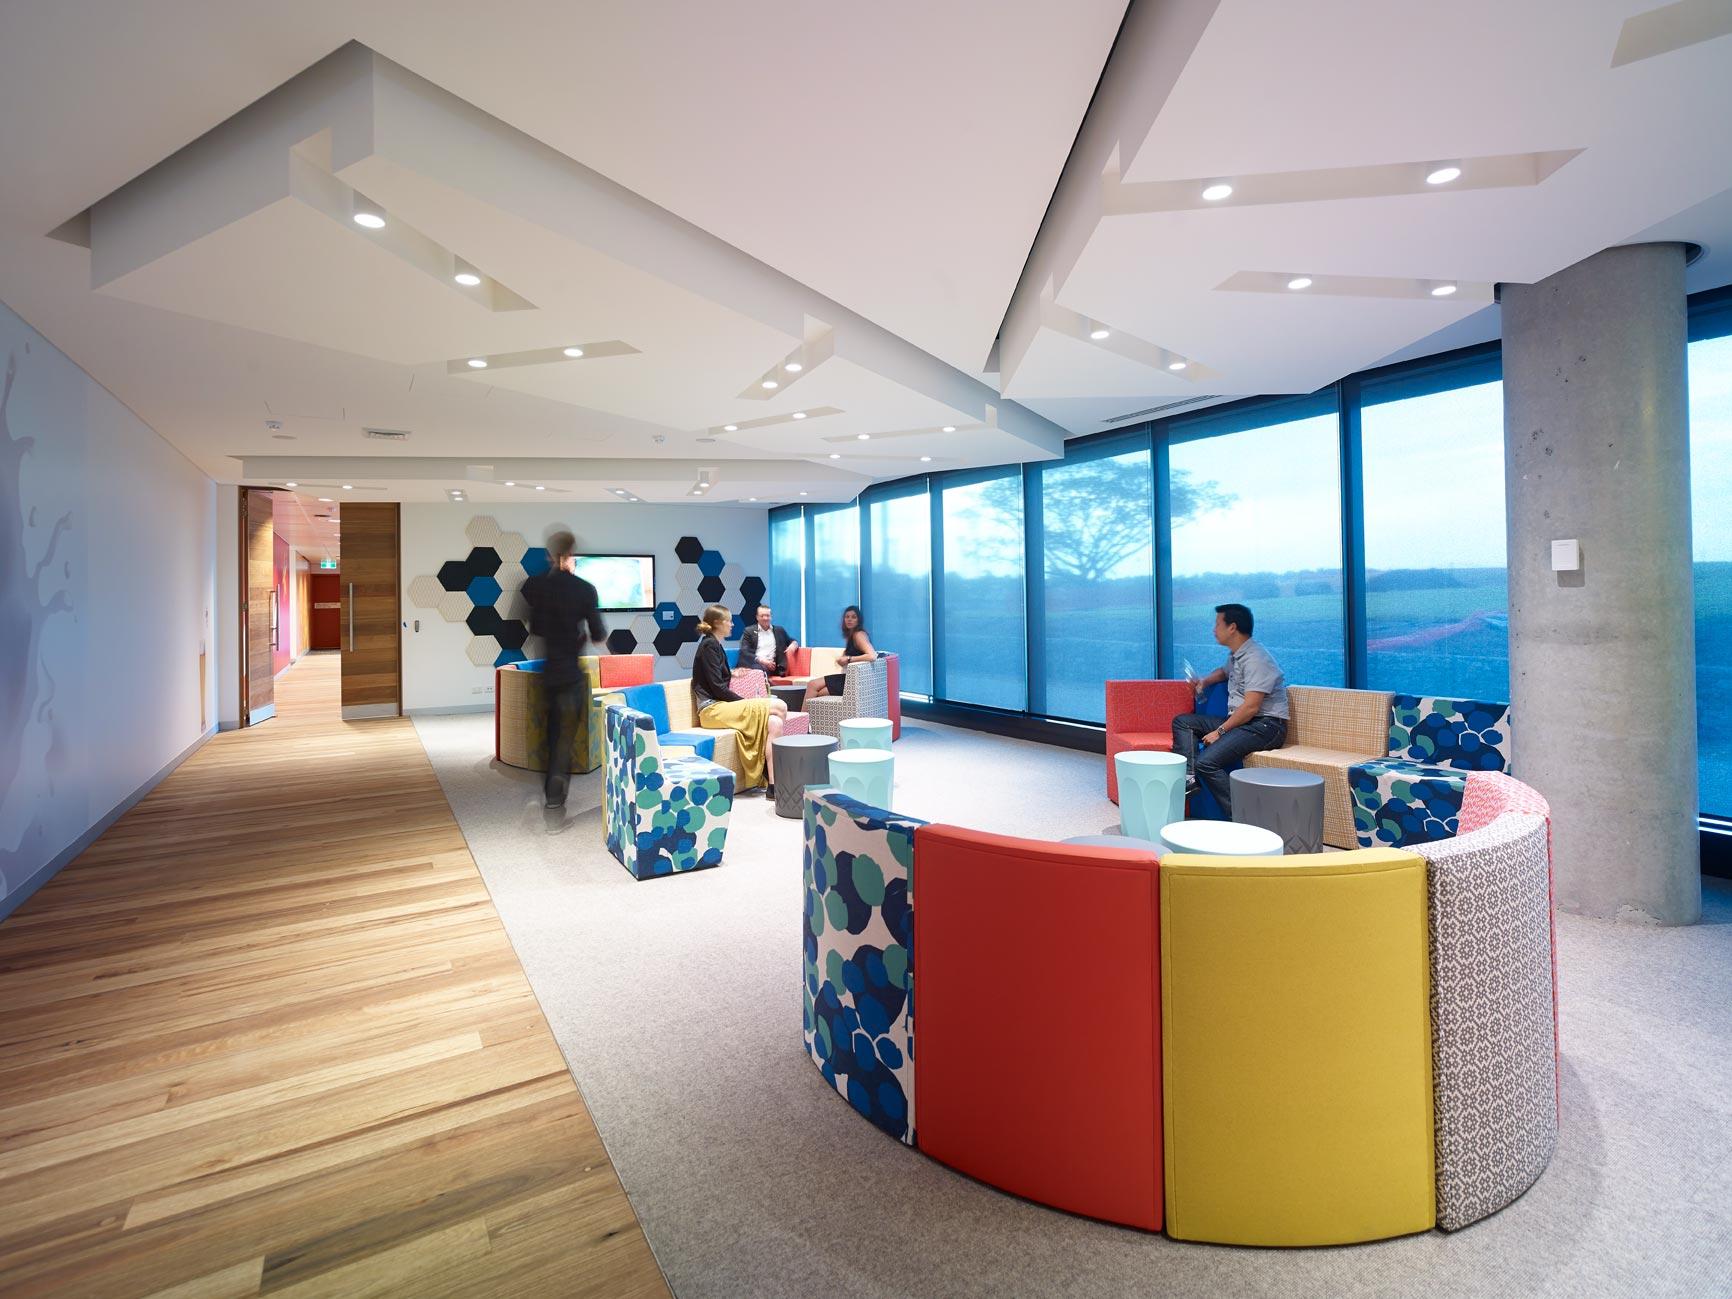 Lion Office Fitout & Construction Management by PCG